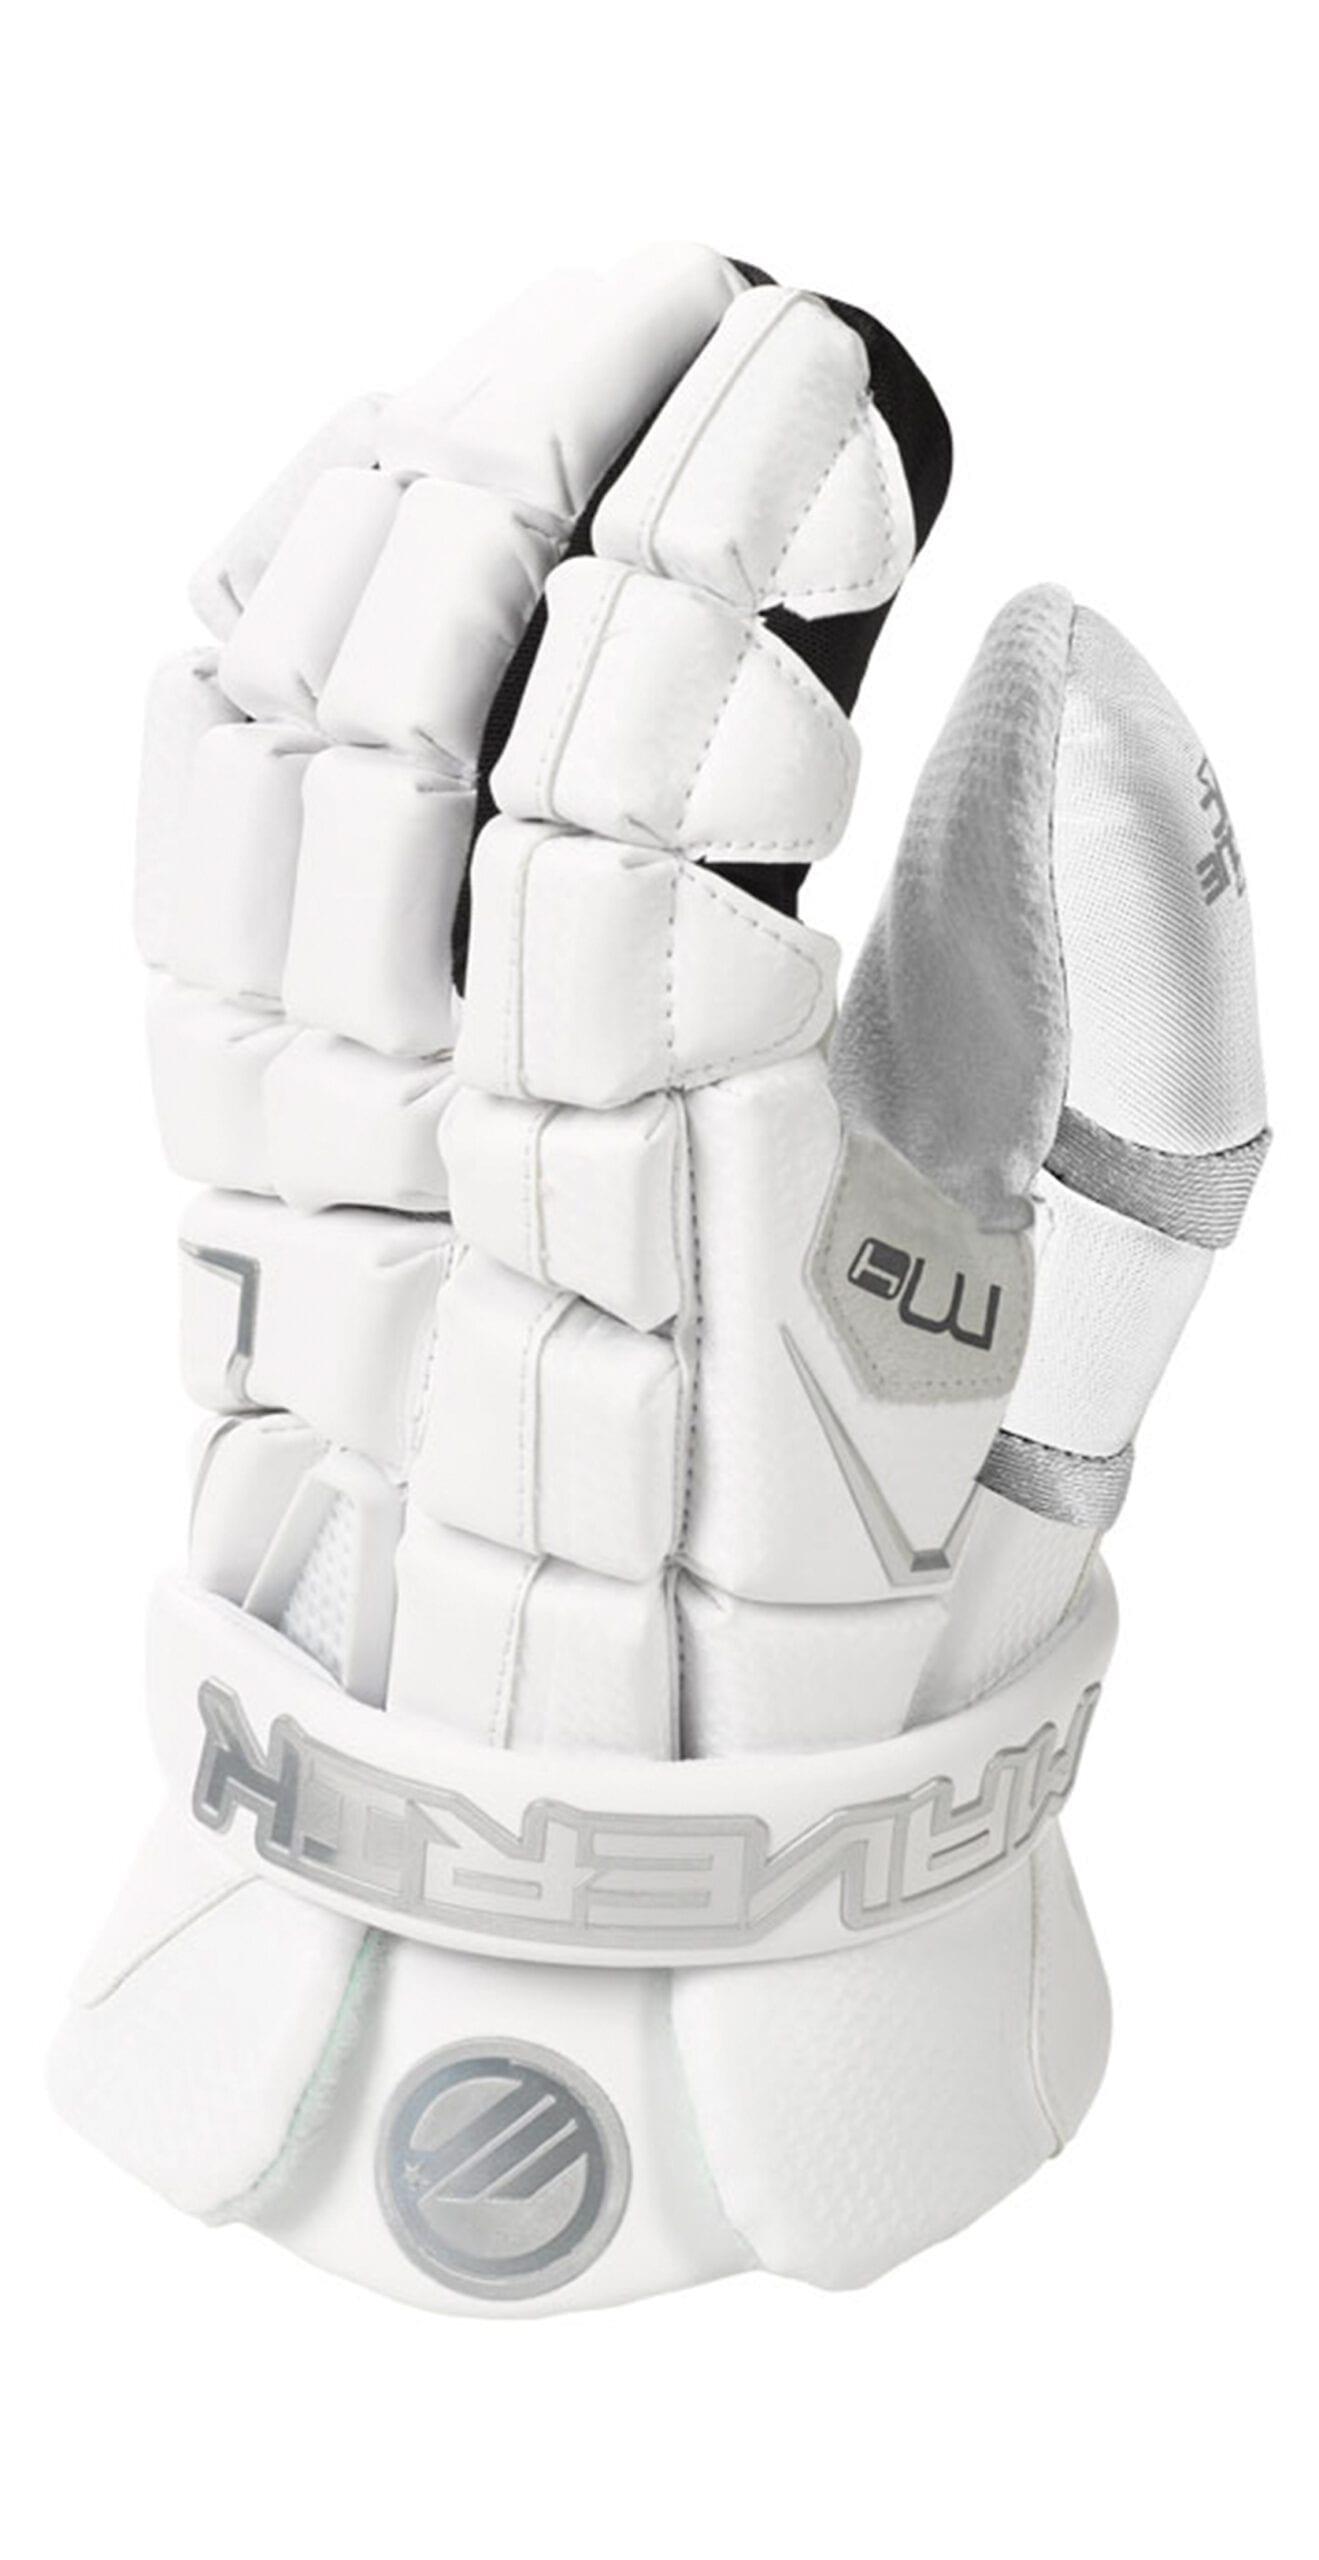 M4-Goalie-Glove_white-scaled-1.jpg